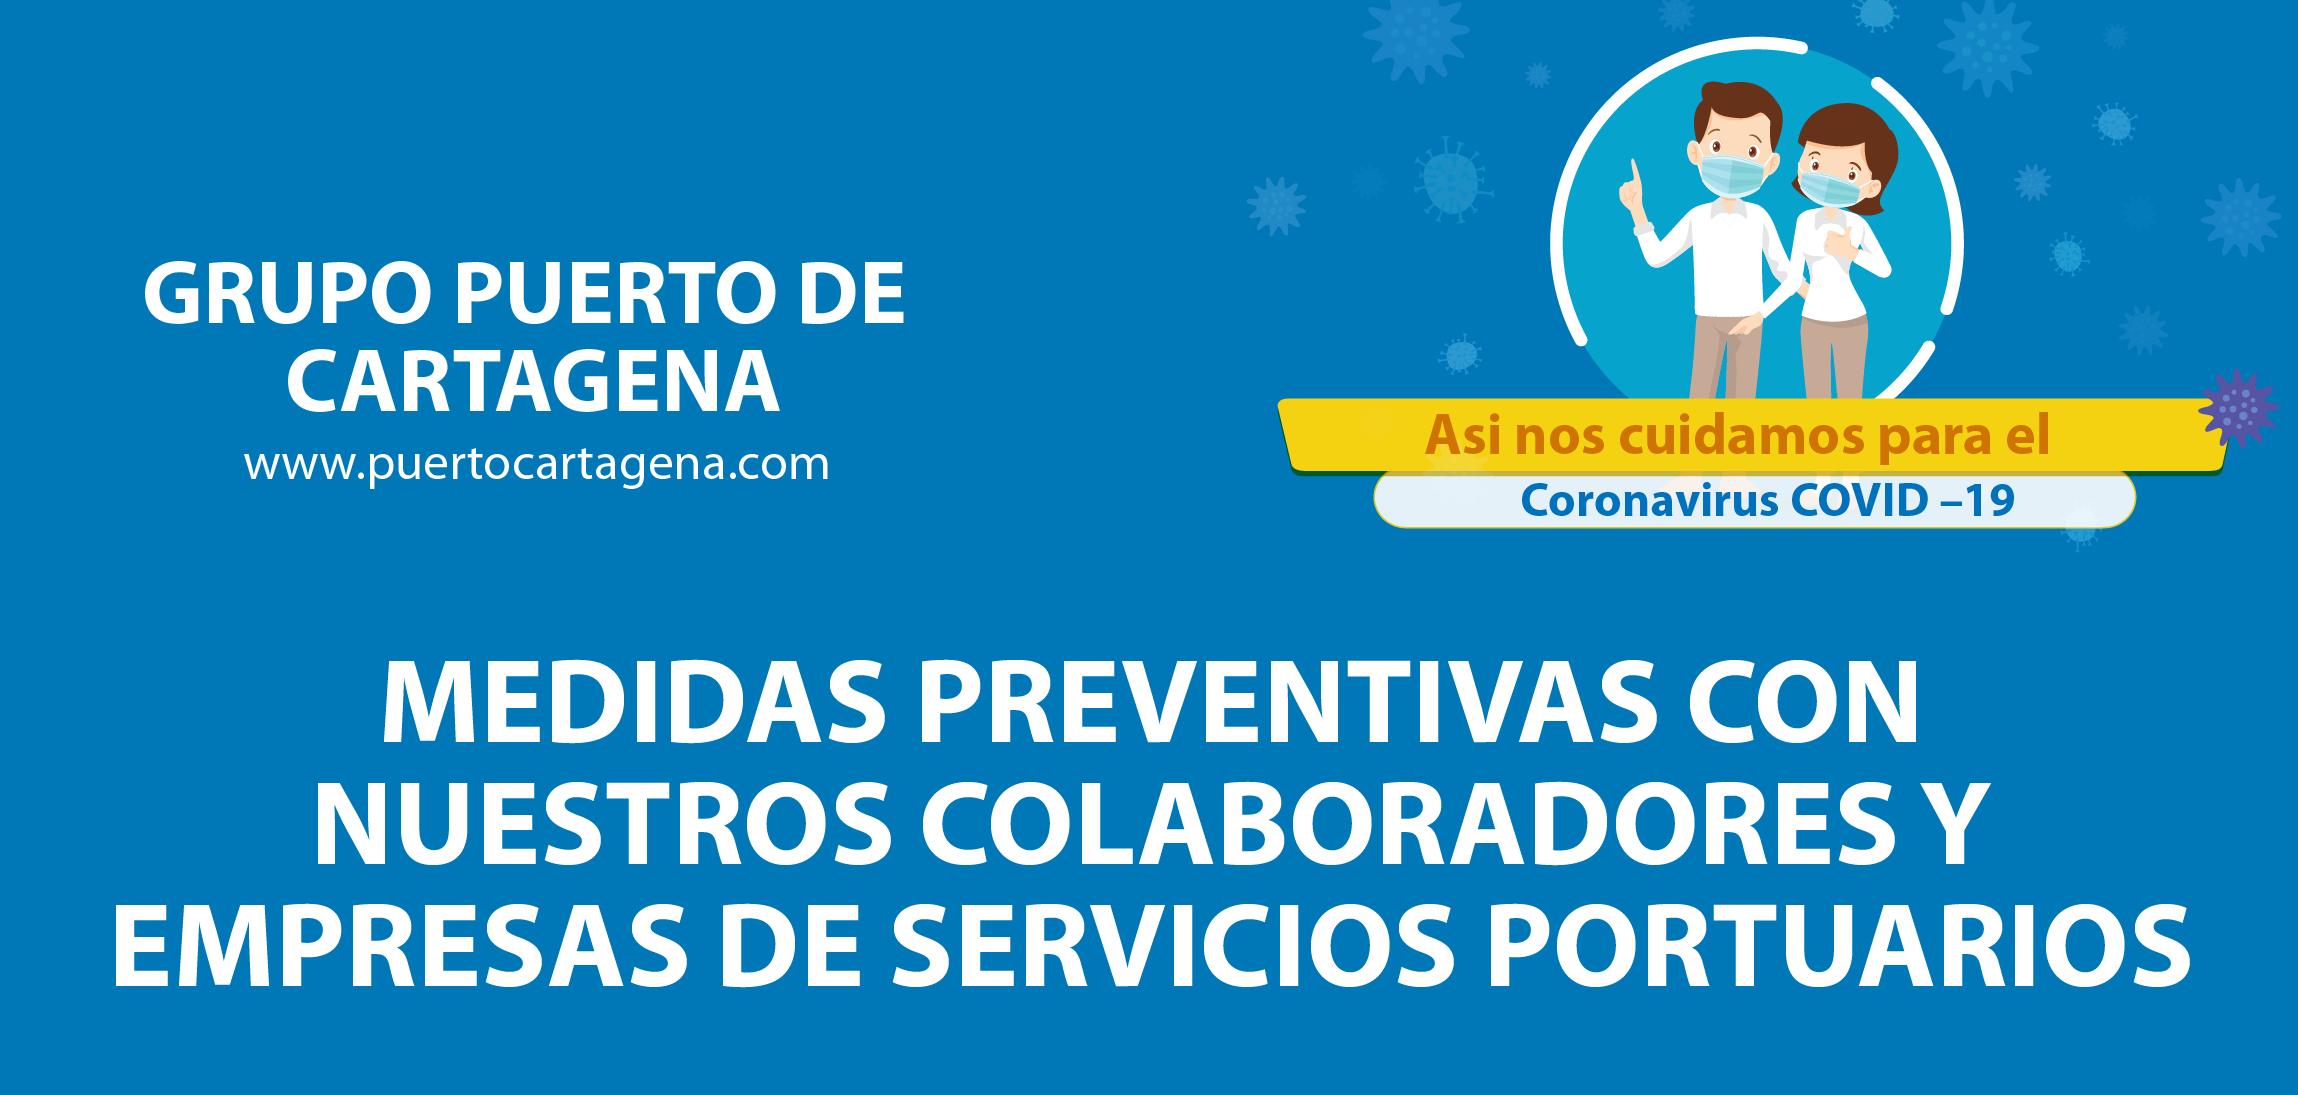 medidas-preventivas-covid-19